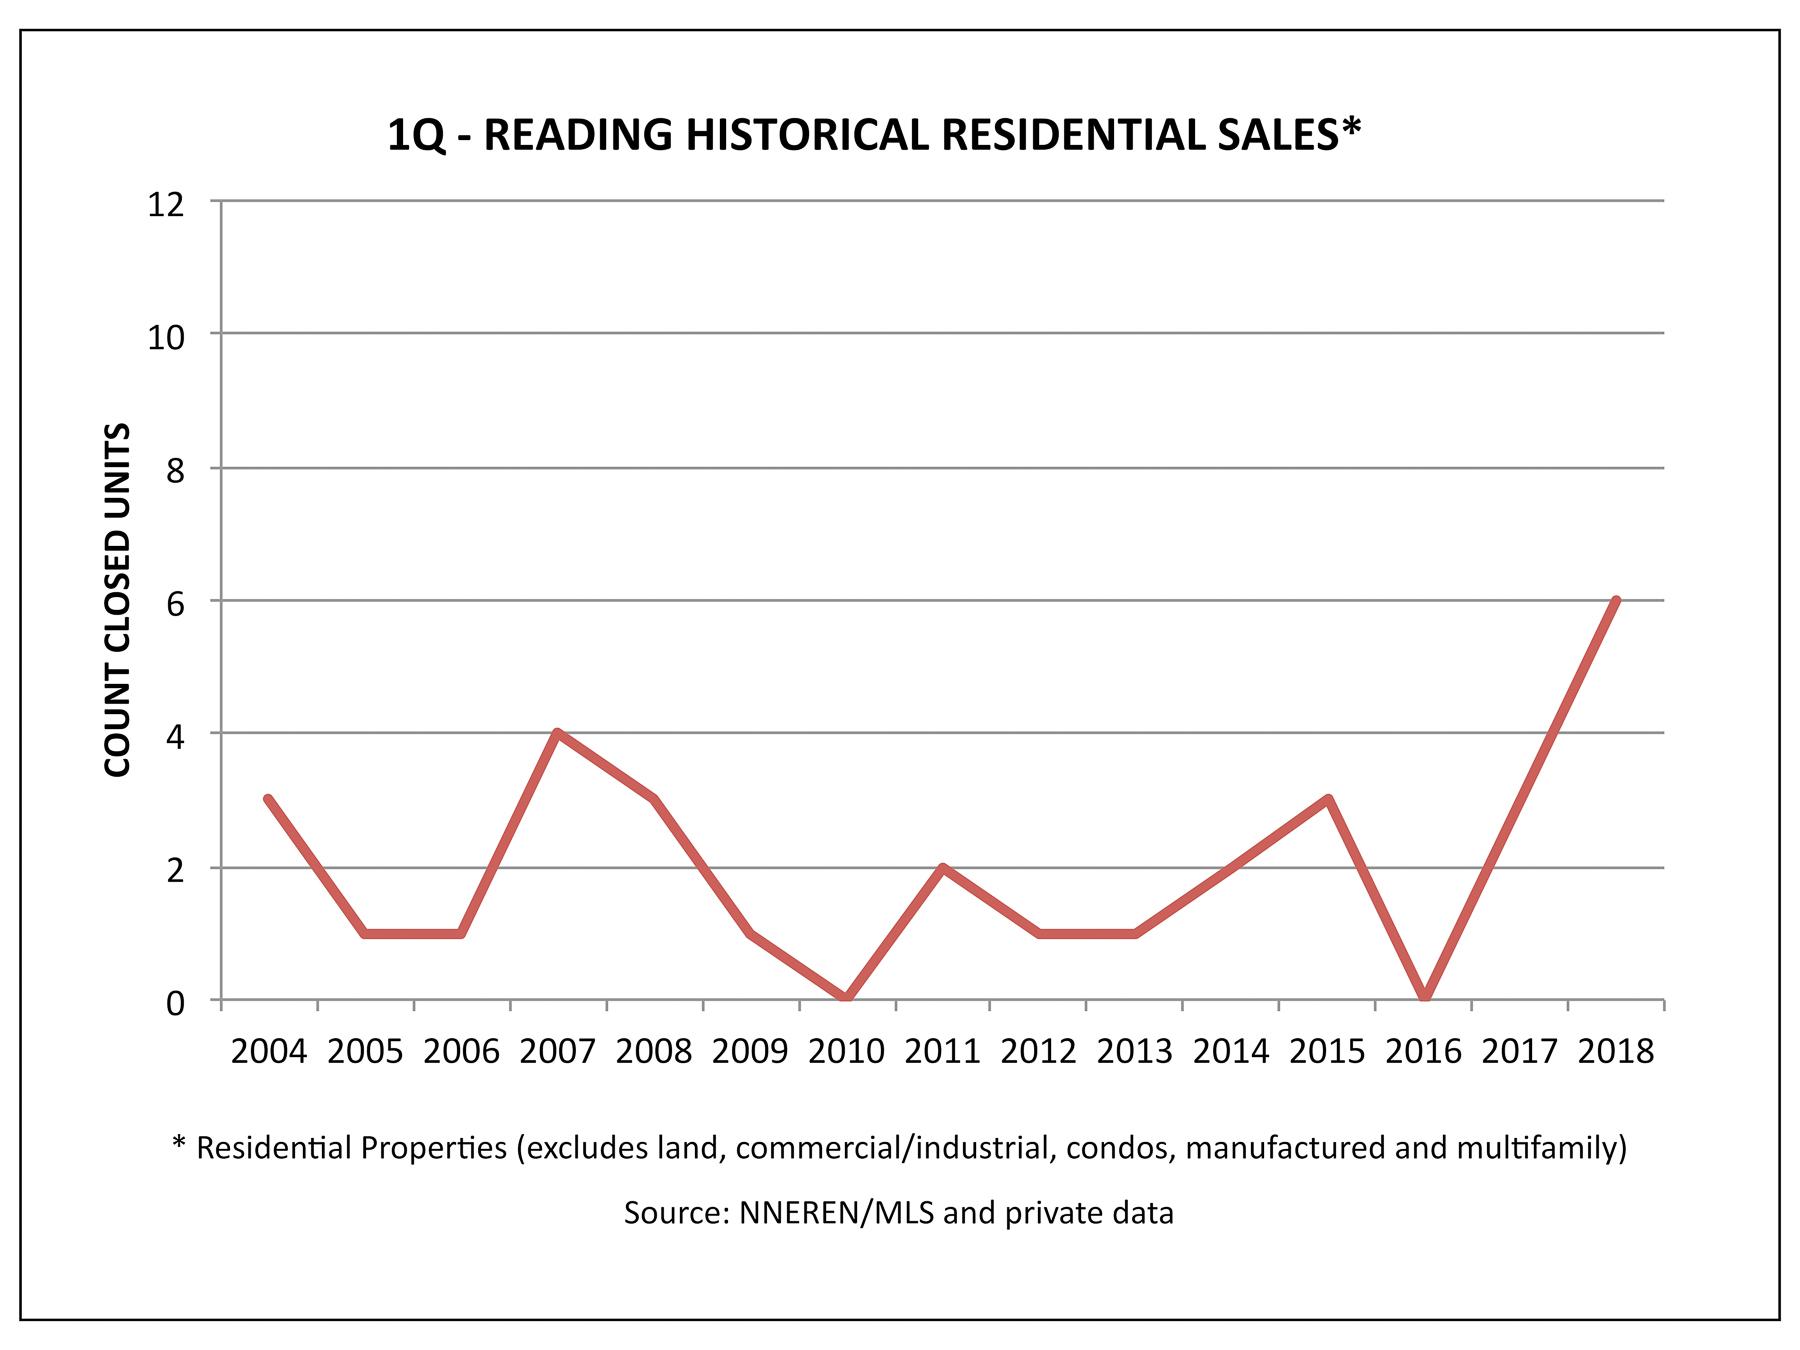 Reading VT Real Estate - Historical 1Q Home Sales